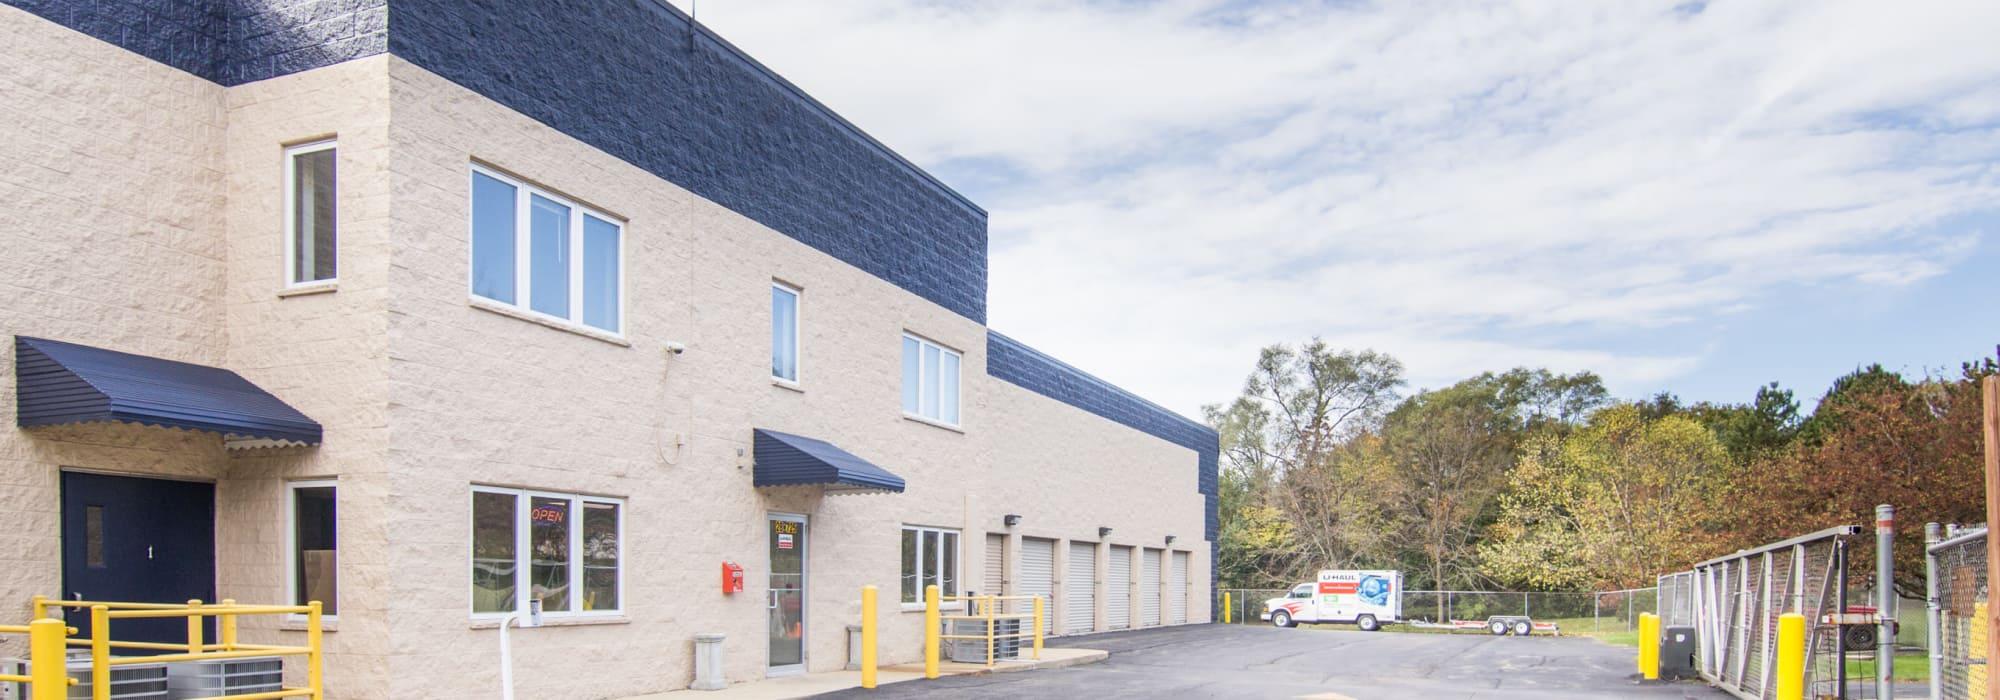 Prime Storage in West Chicago, IL